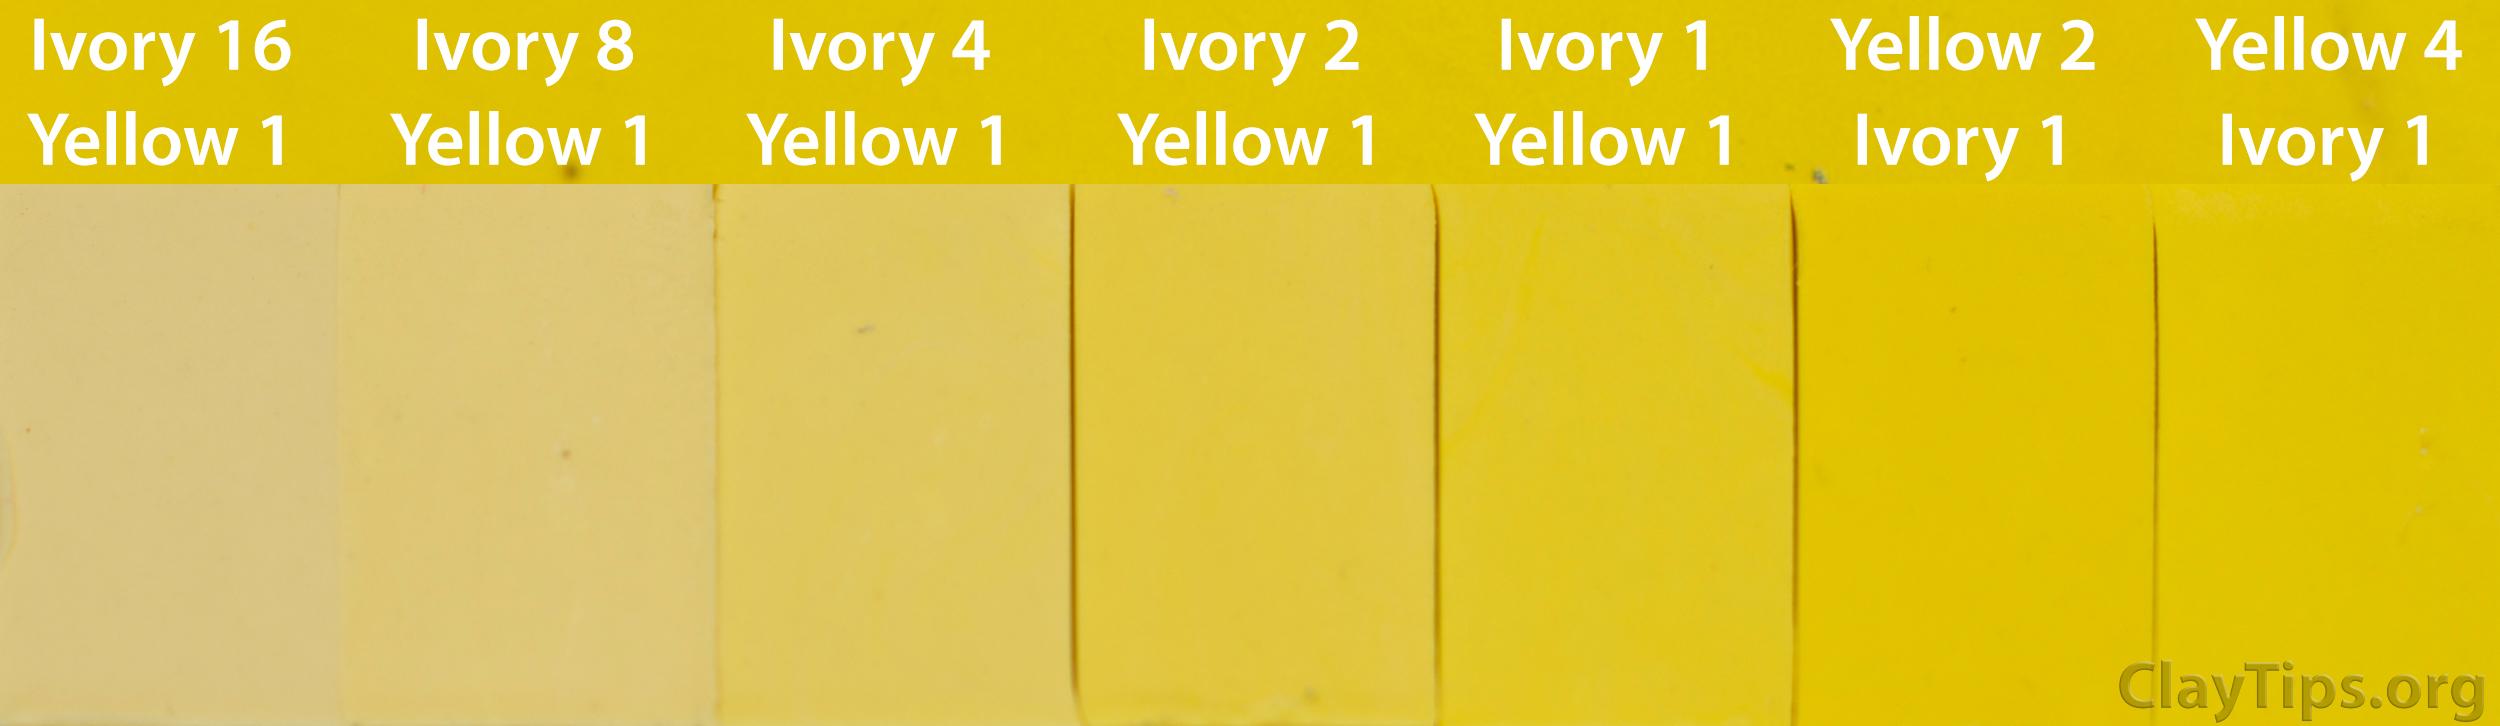 Yellow and Ivory Plasticine